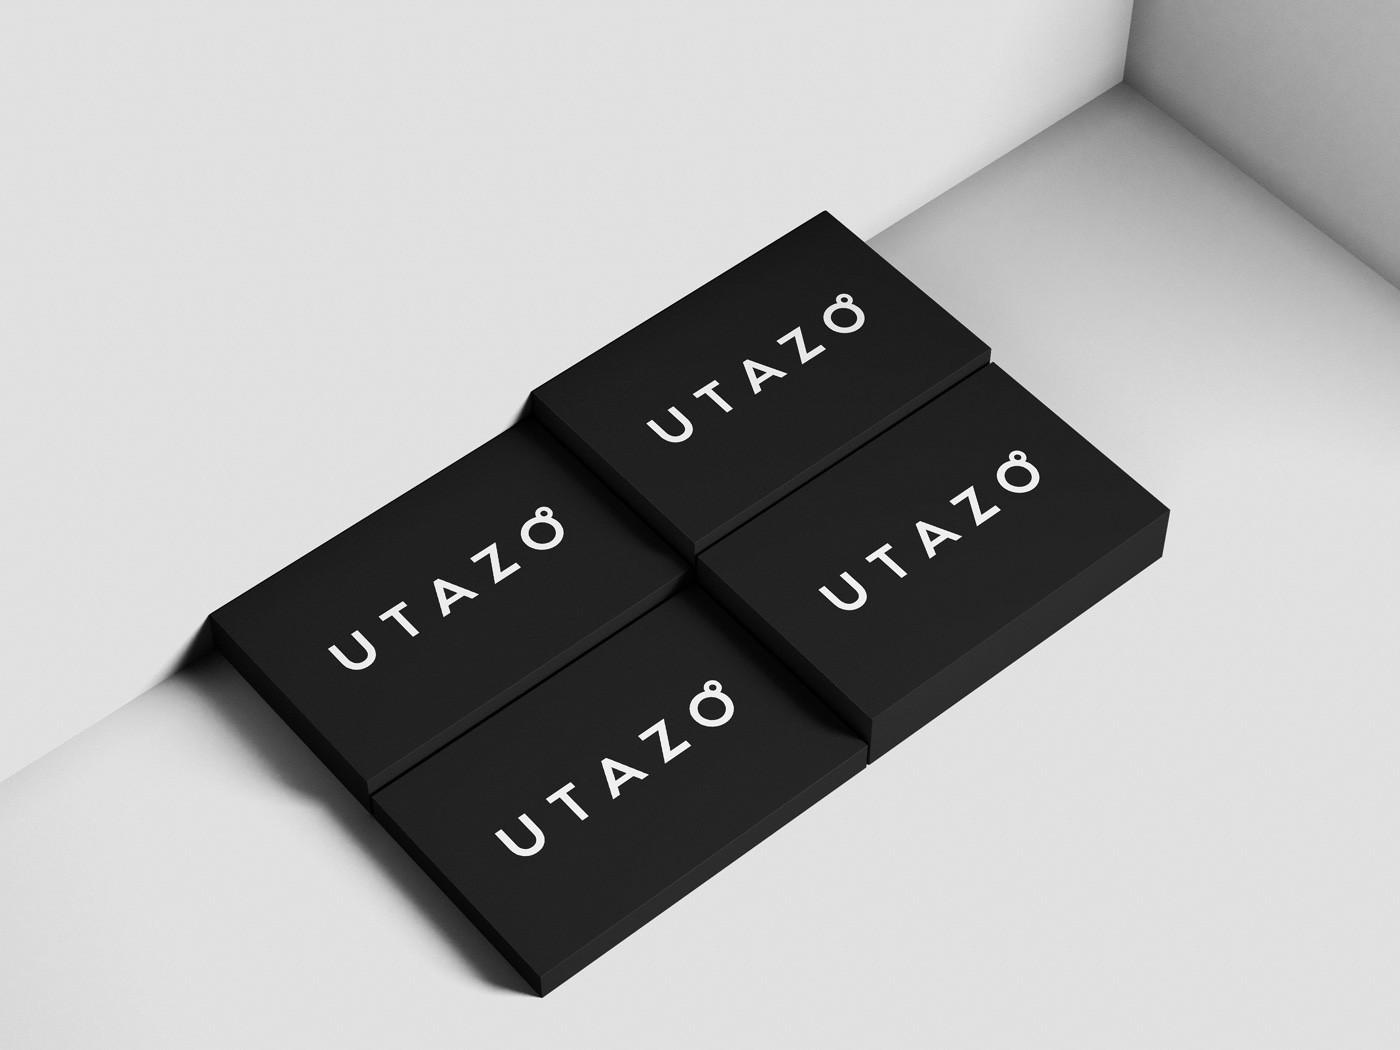 Utazo-9.jpg